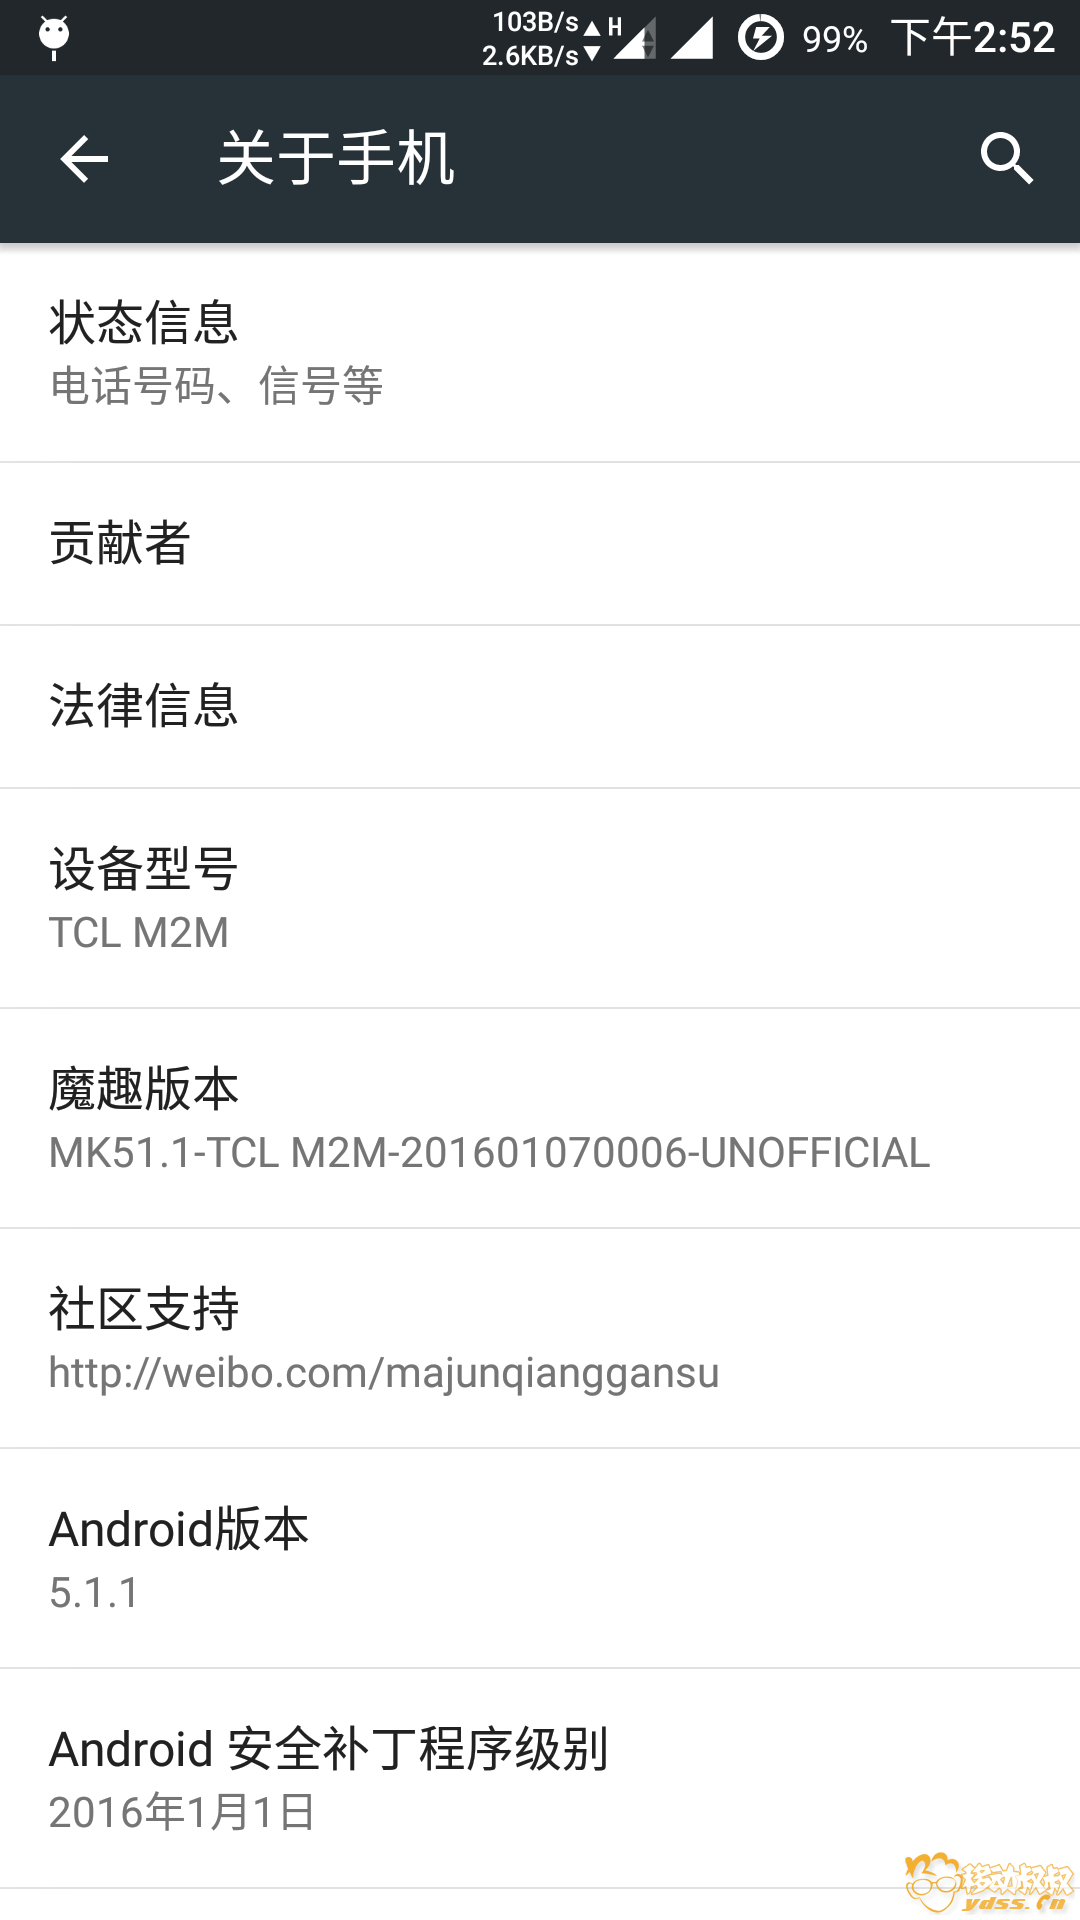 Screenshot_2016-01-07-14-52-30.png